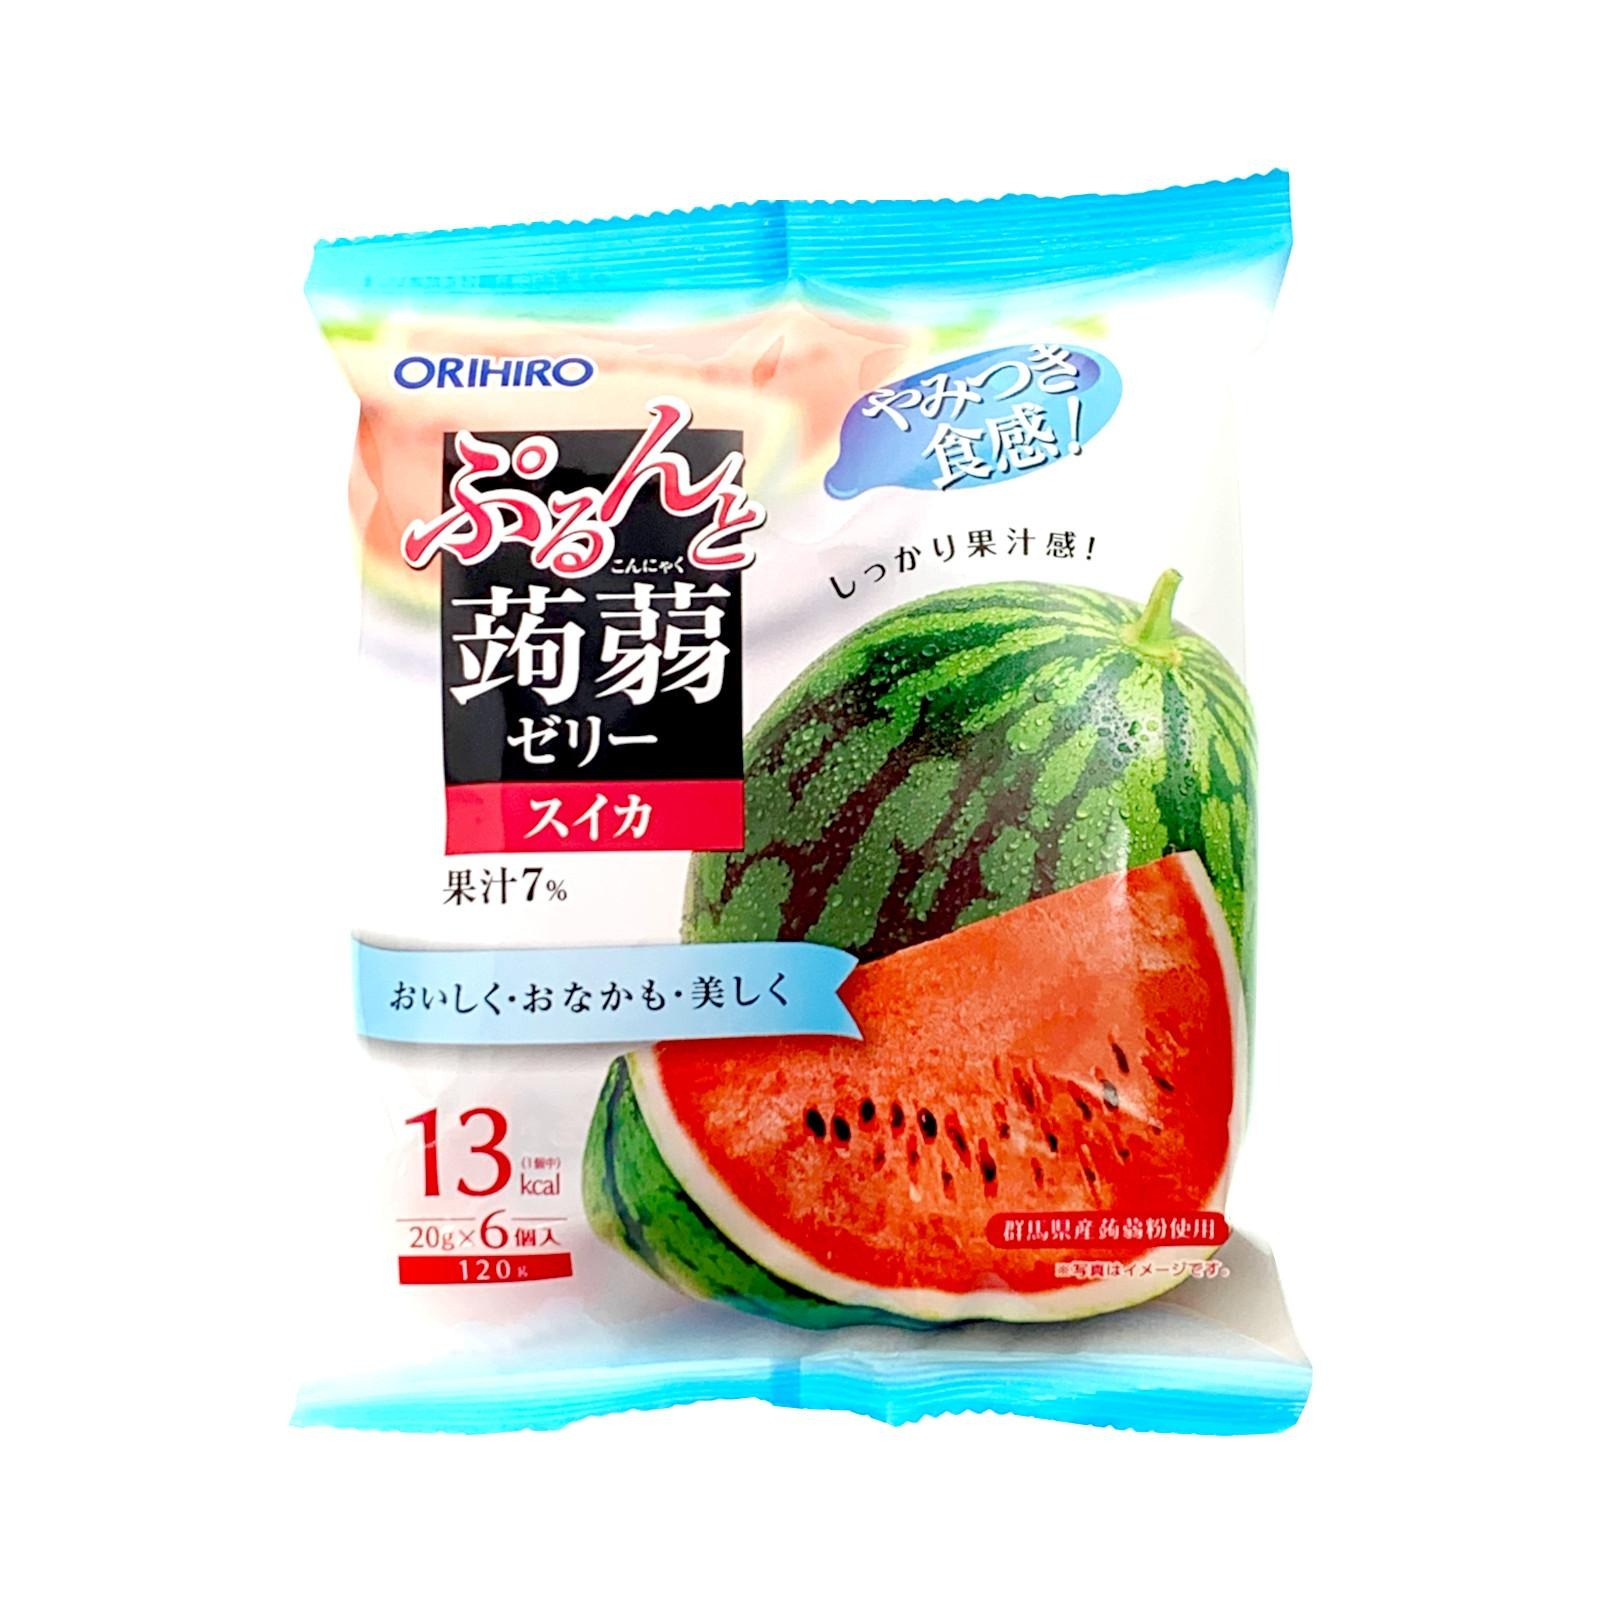 Orihiro Purun To Konnyaku Jelly Watermelon